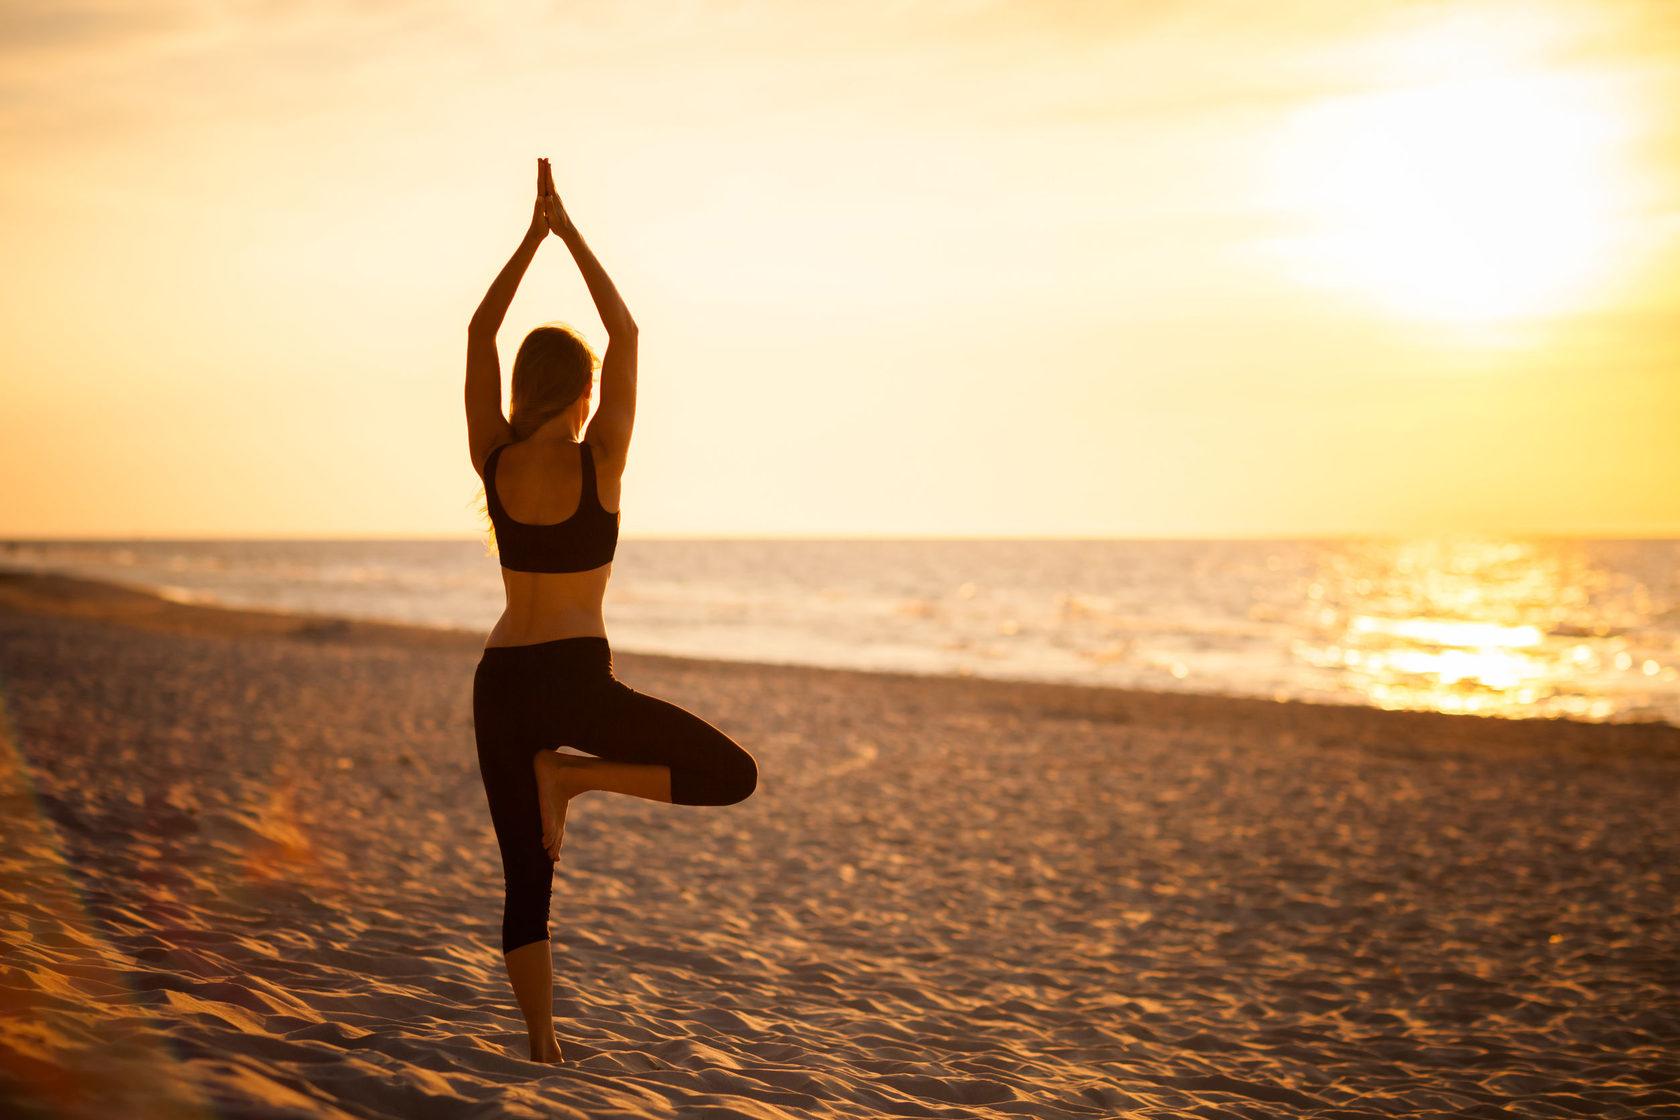 сайте йога на берегу моря фото настоящее время